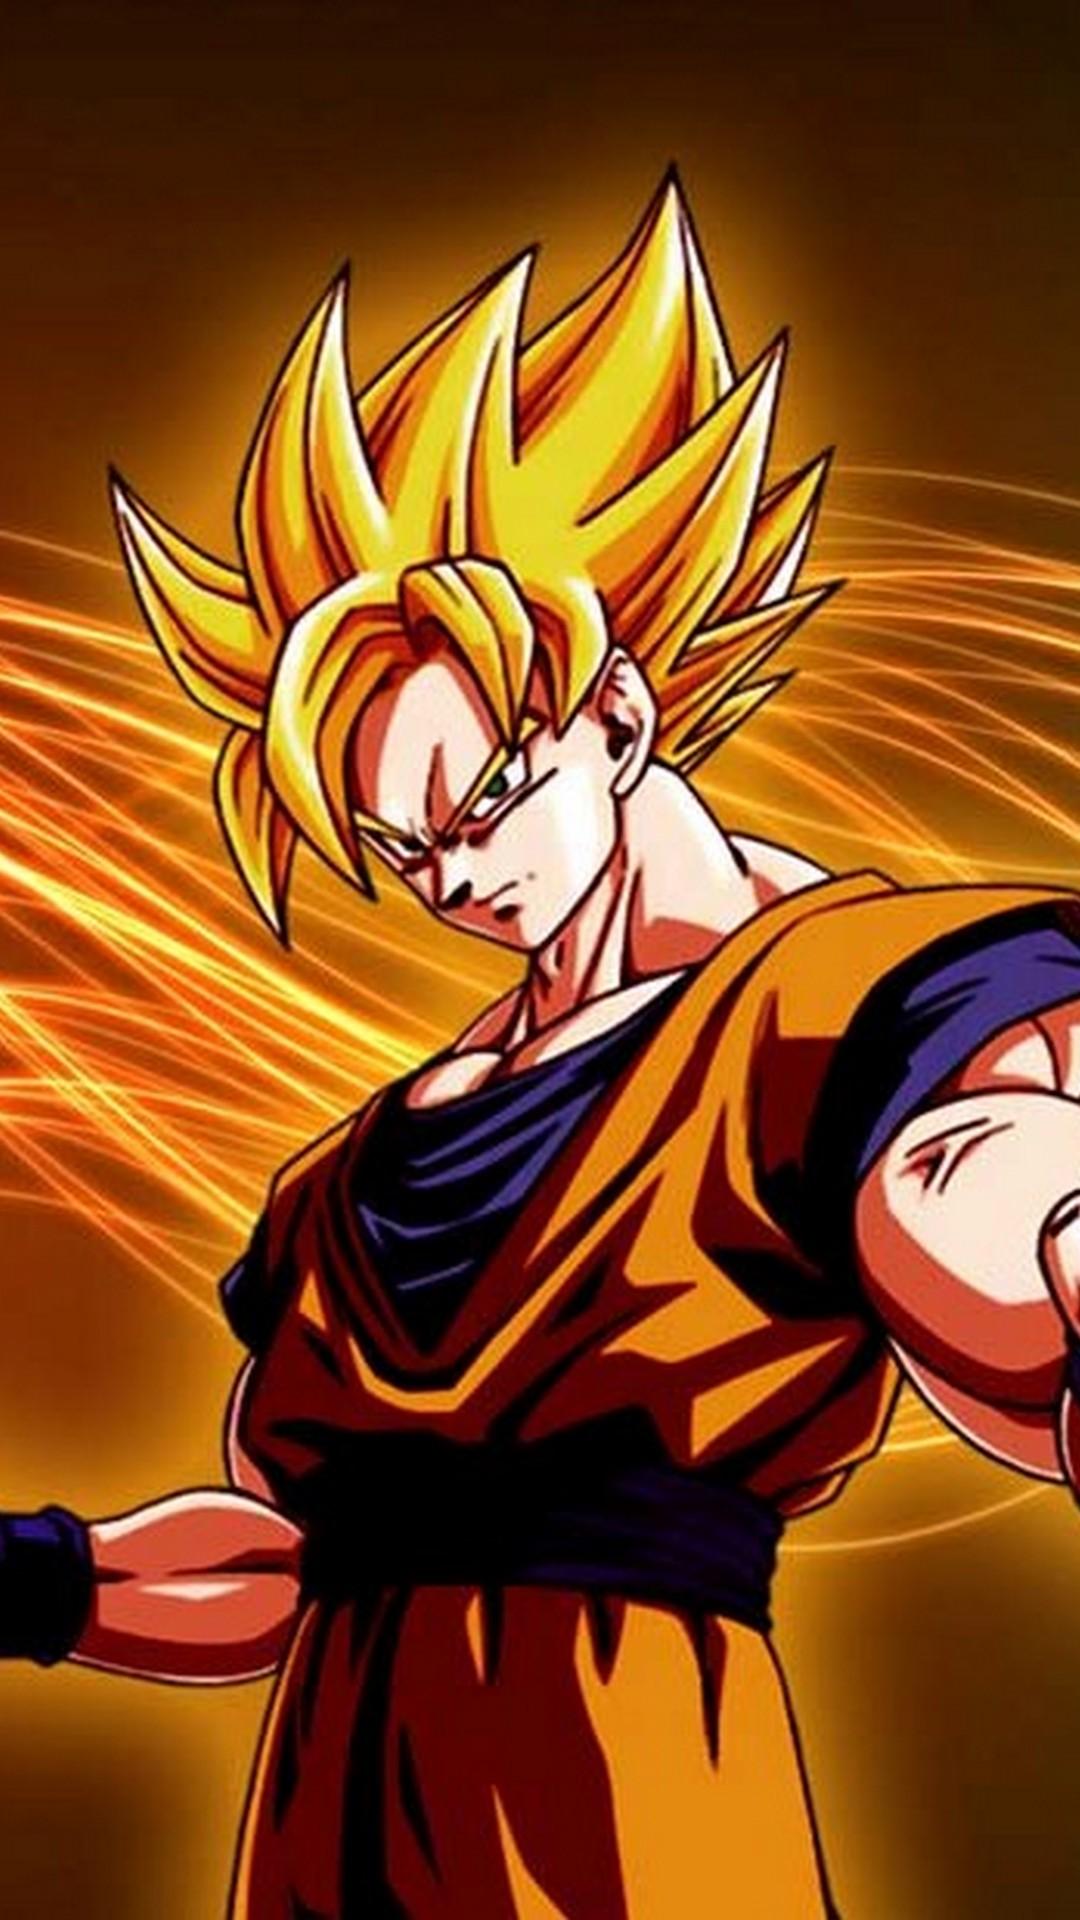 Dragon Ball Z Goku Super Saiyan 2247502 Hd Wallpaper